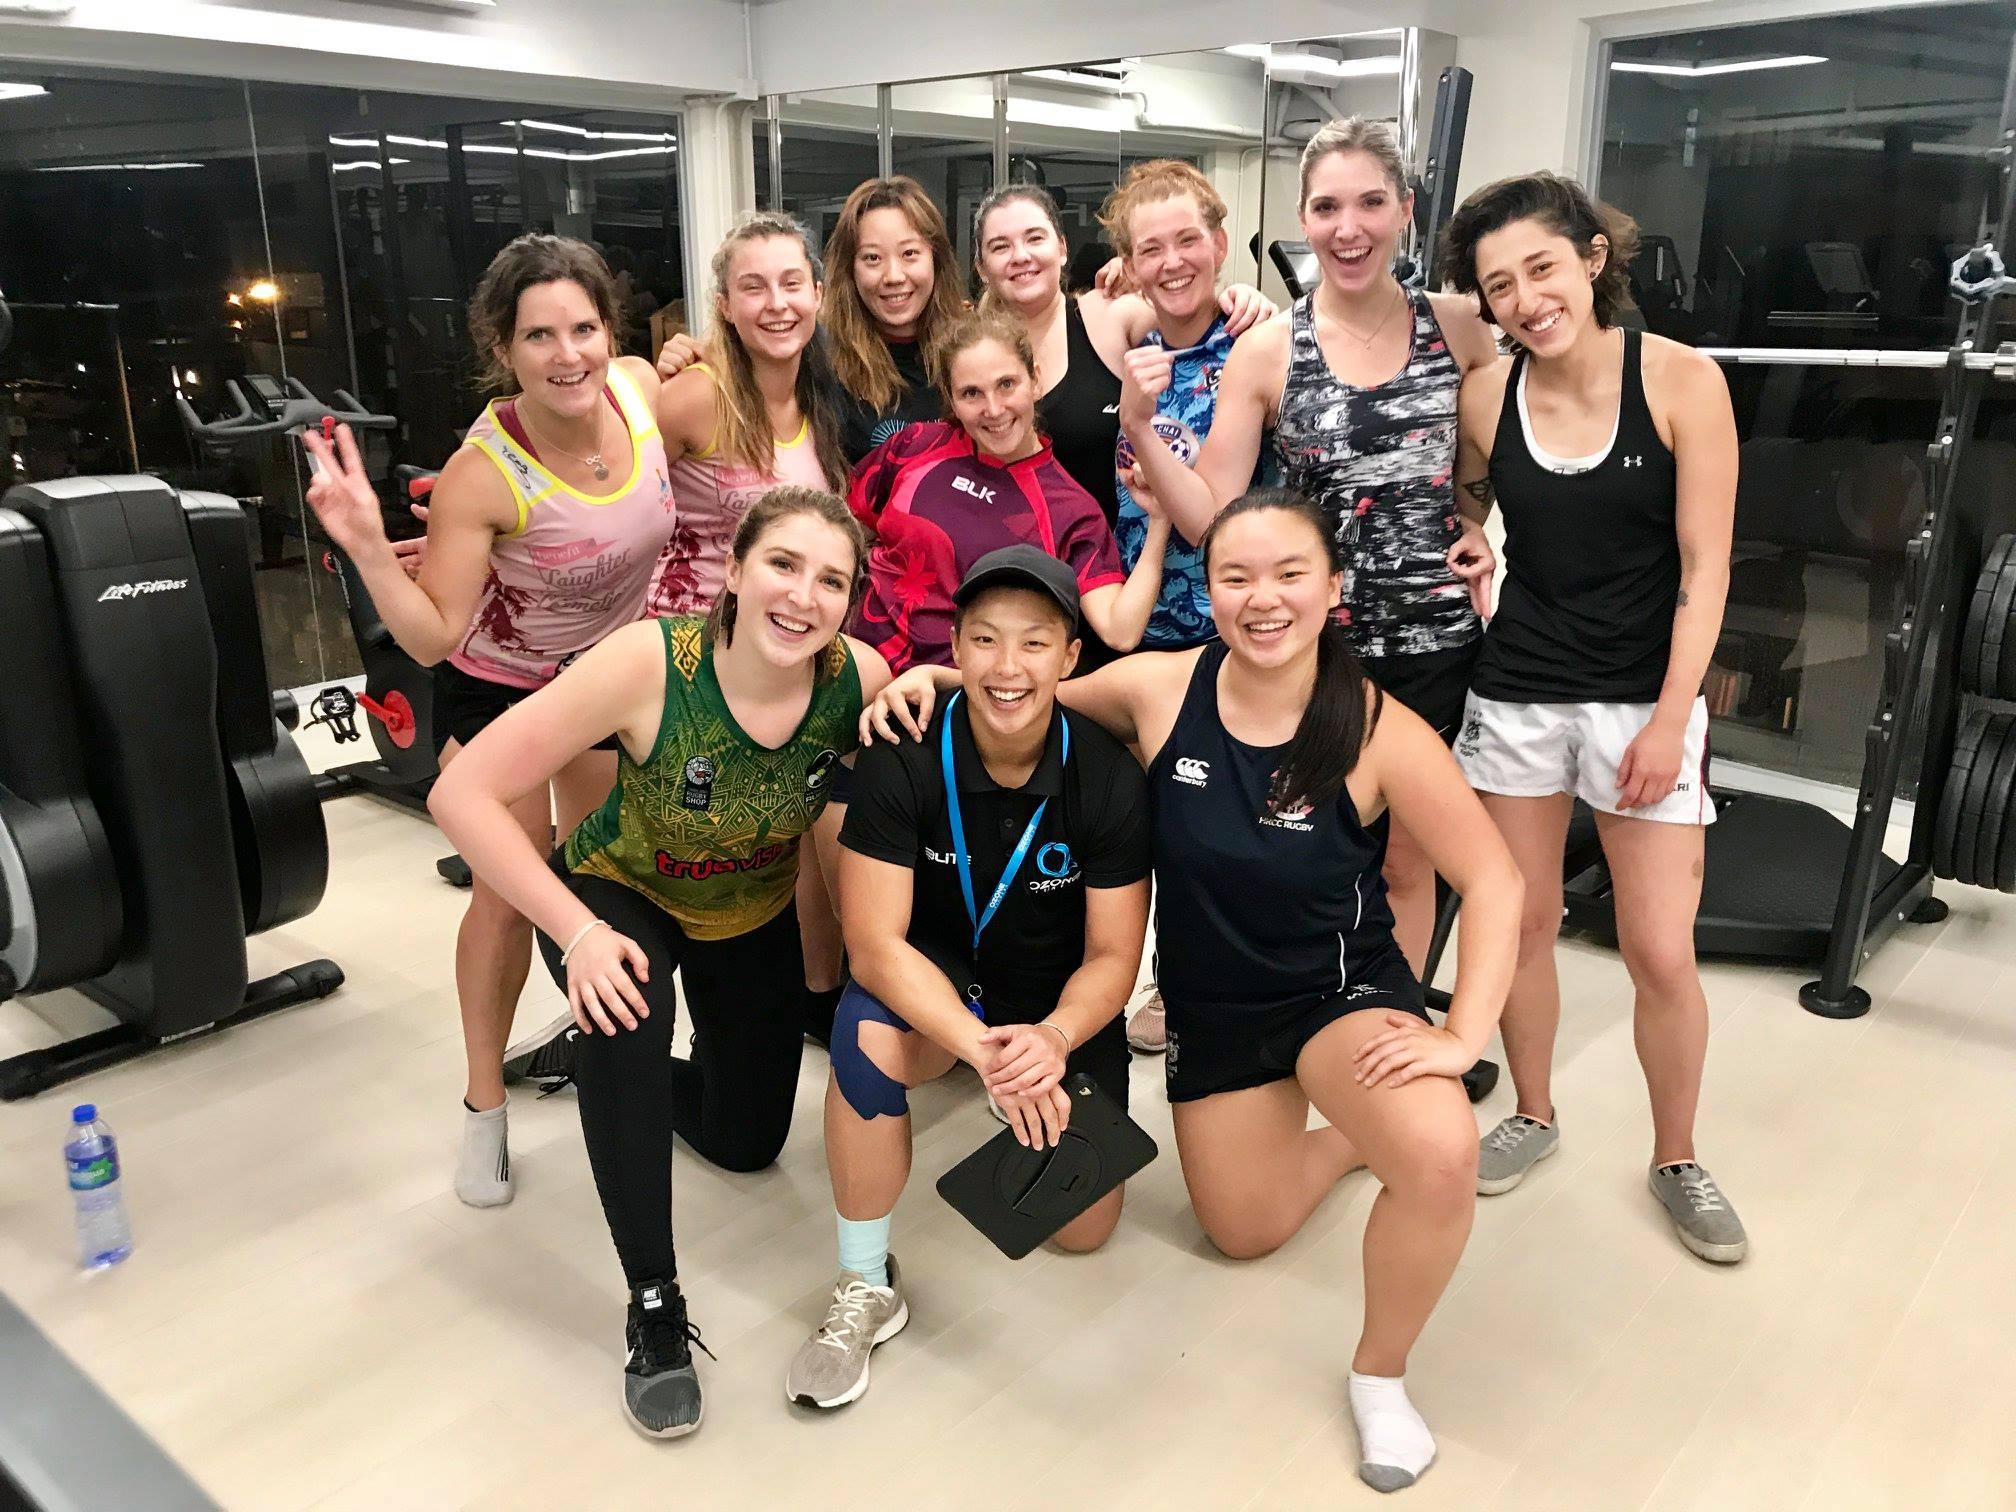 Hku sandy bay womens invitational xvs tournament hku sandy bay rfc